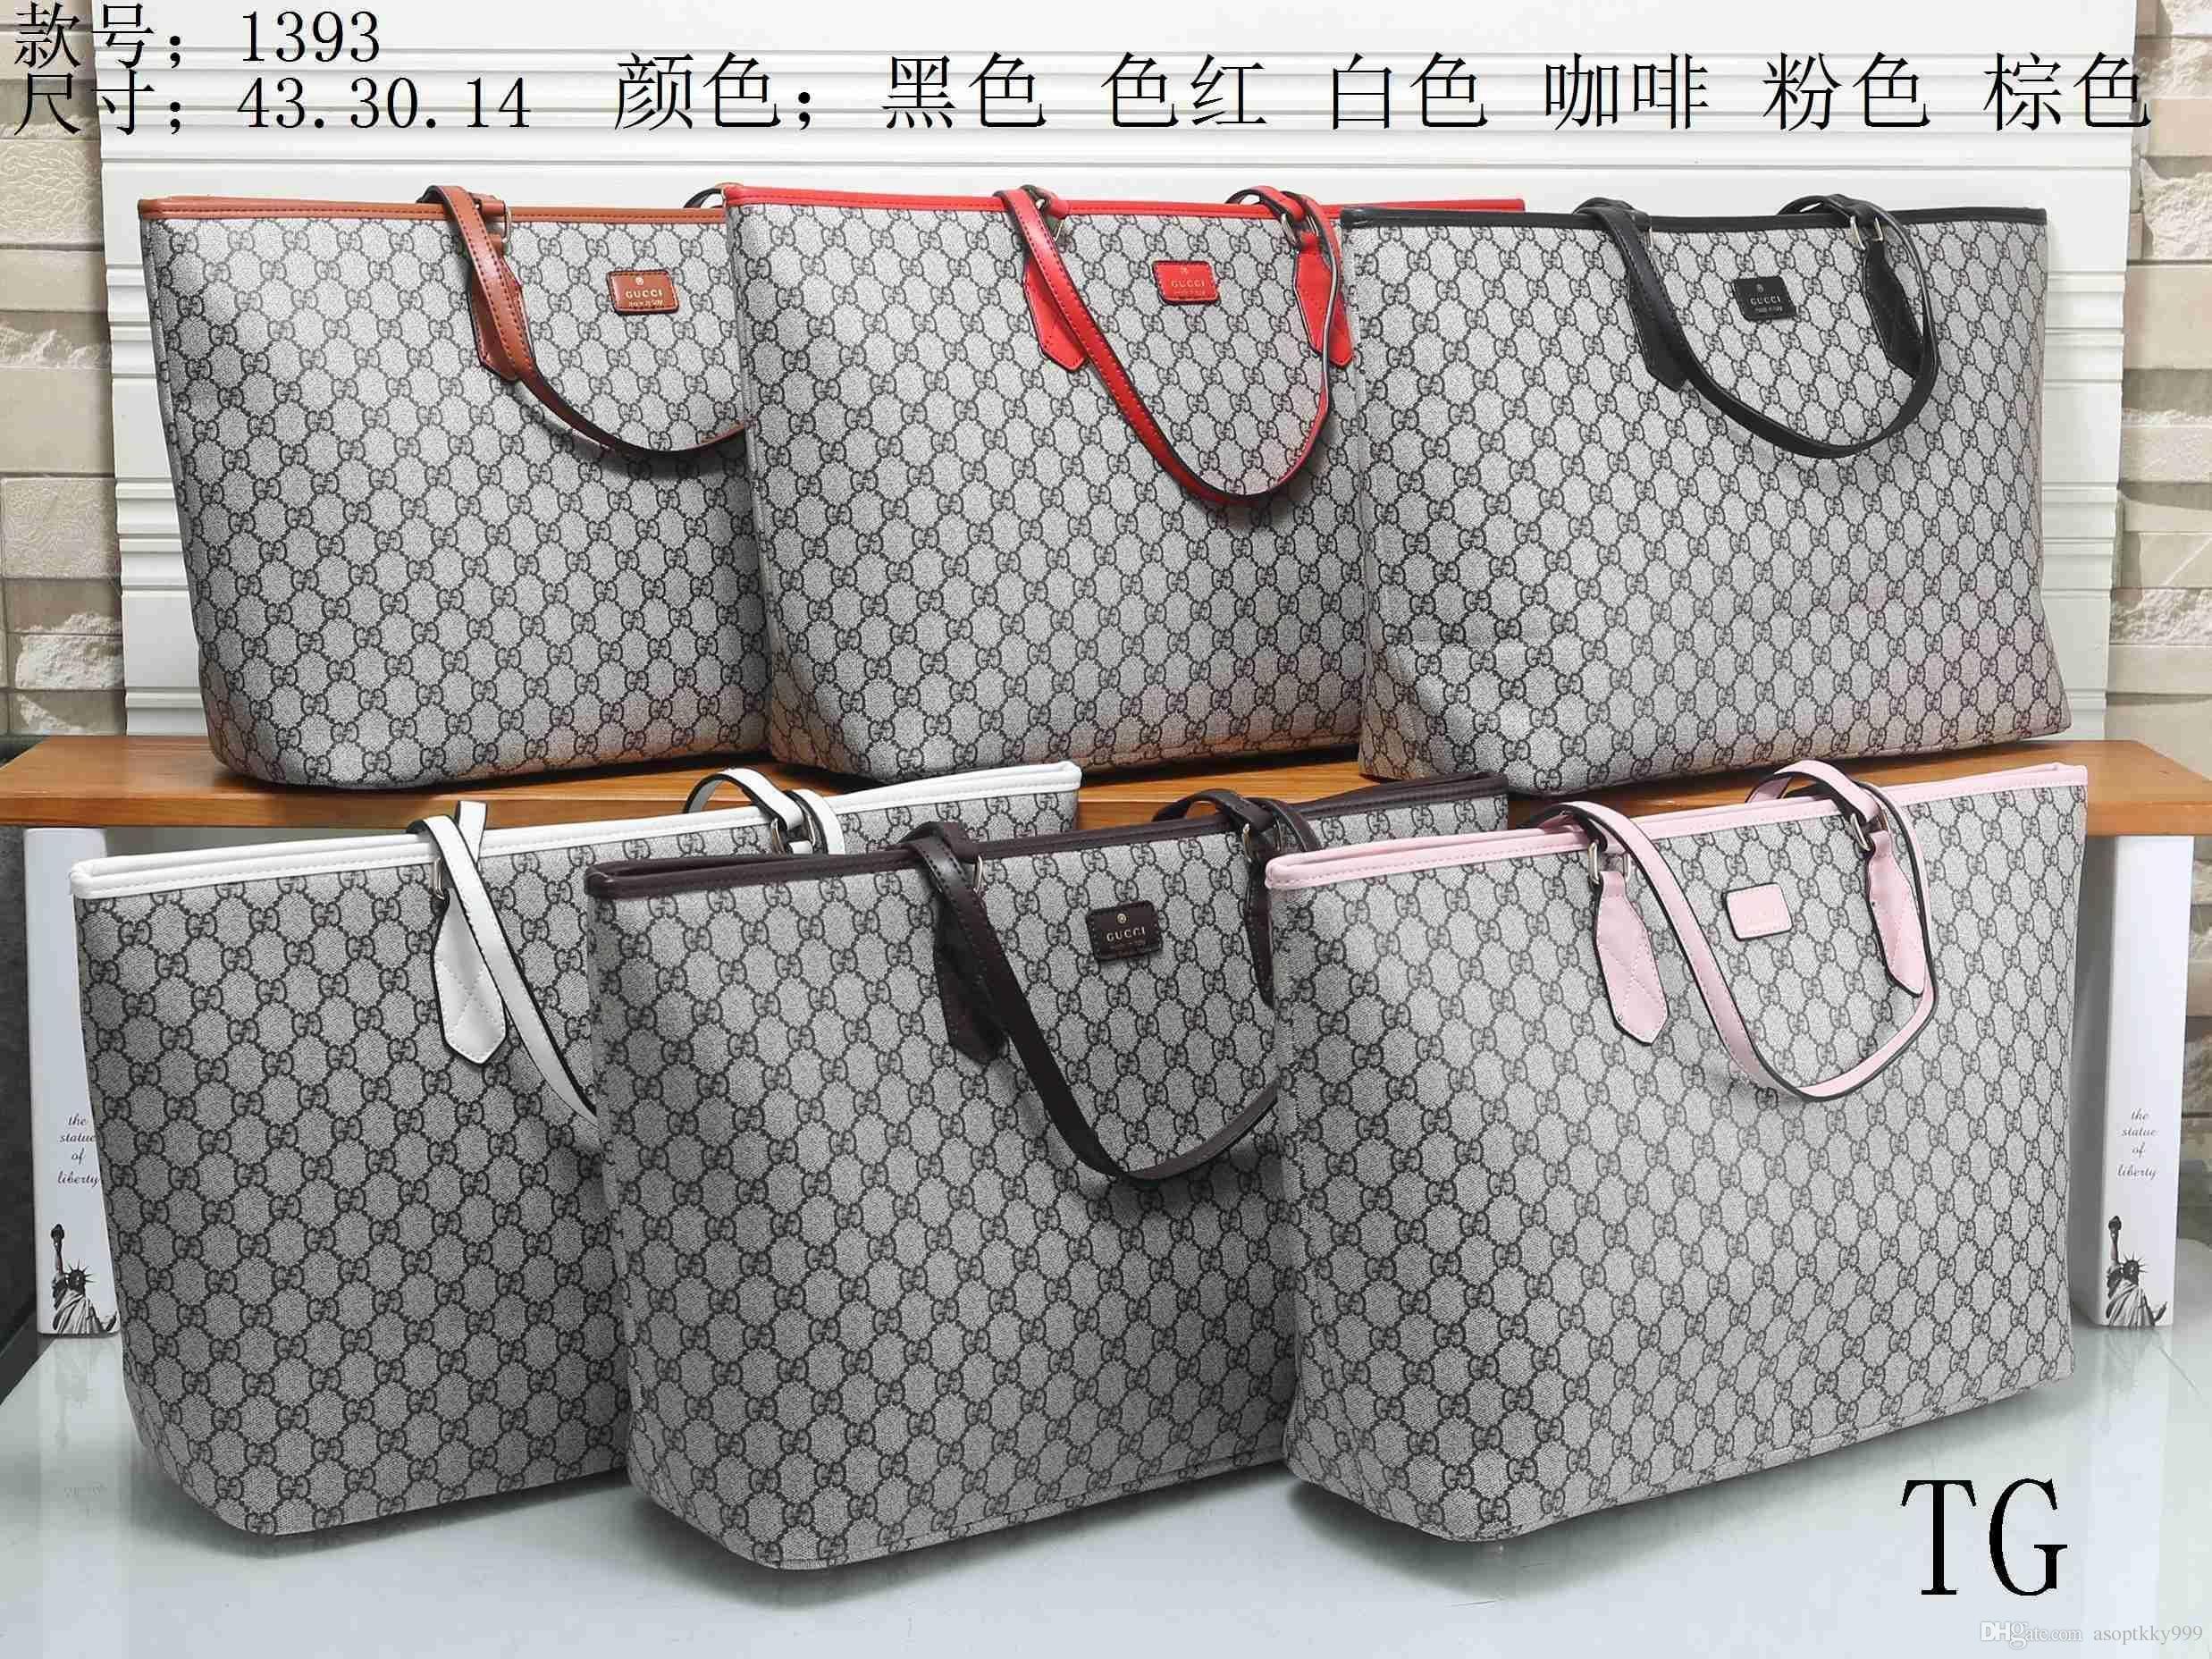 c197e125cb11 2019 2018 NEW Styles Fashion Bags Ladies Handbags Designer Bags Women Tote  Bag Luxury Brands Bags Single Shoulder Bag Backpack Wallet 1393 From  Linjie8188